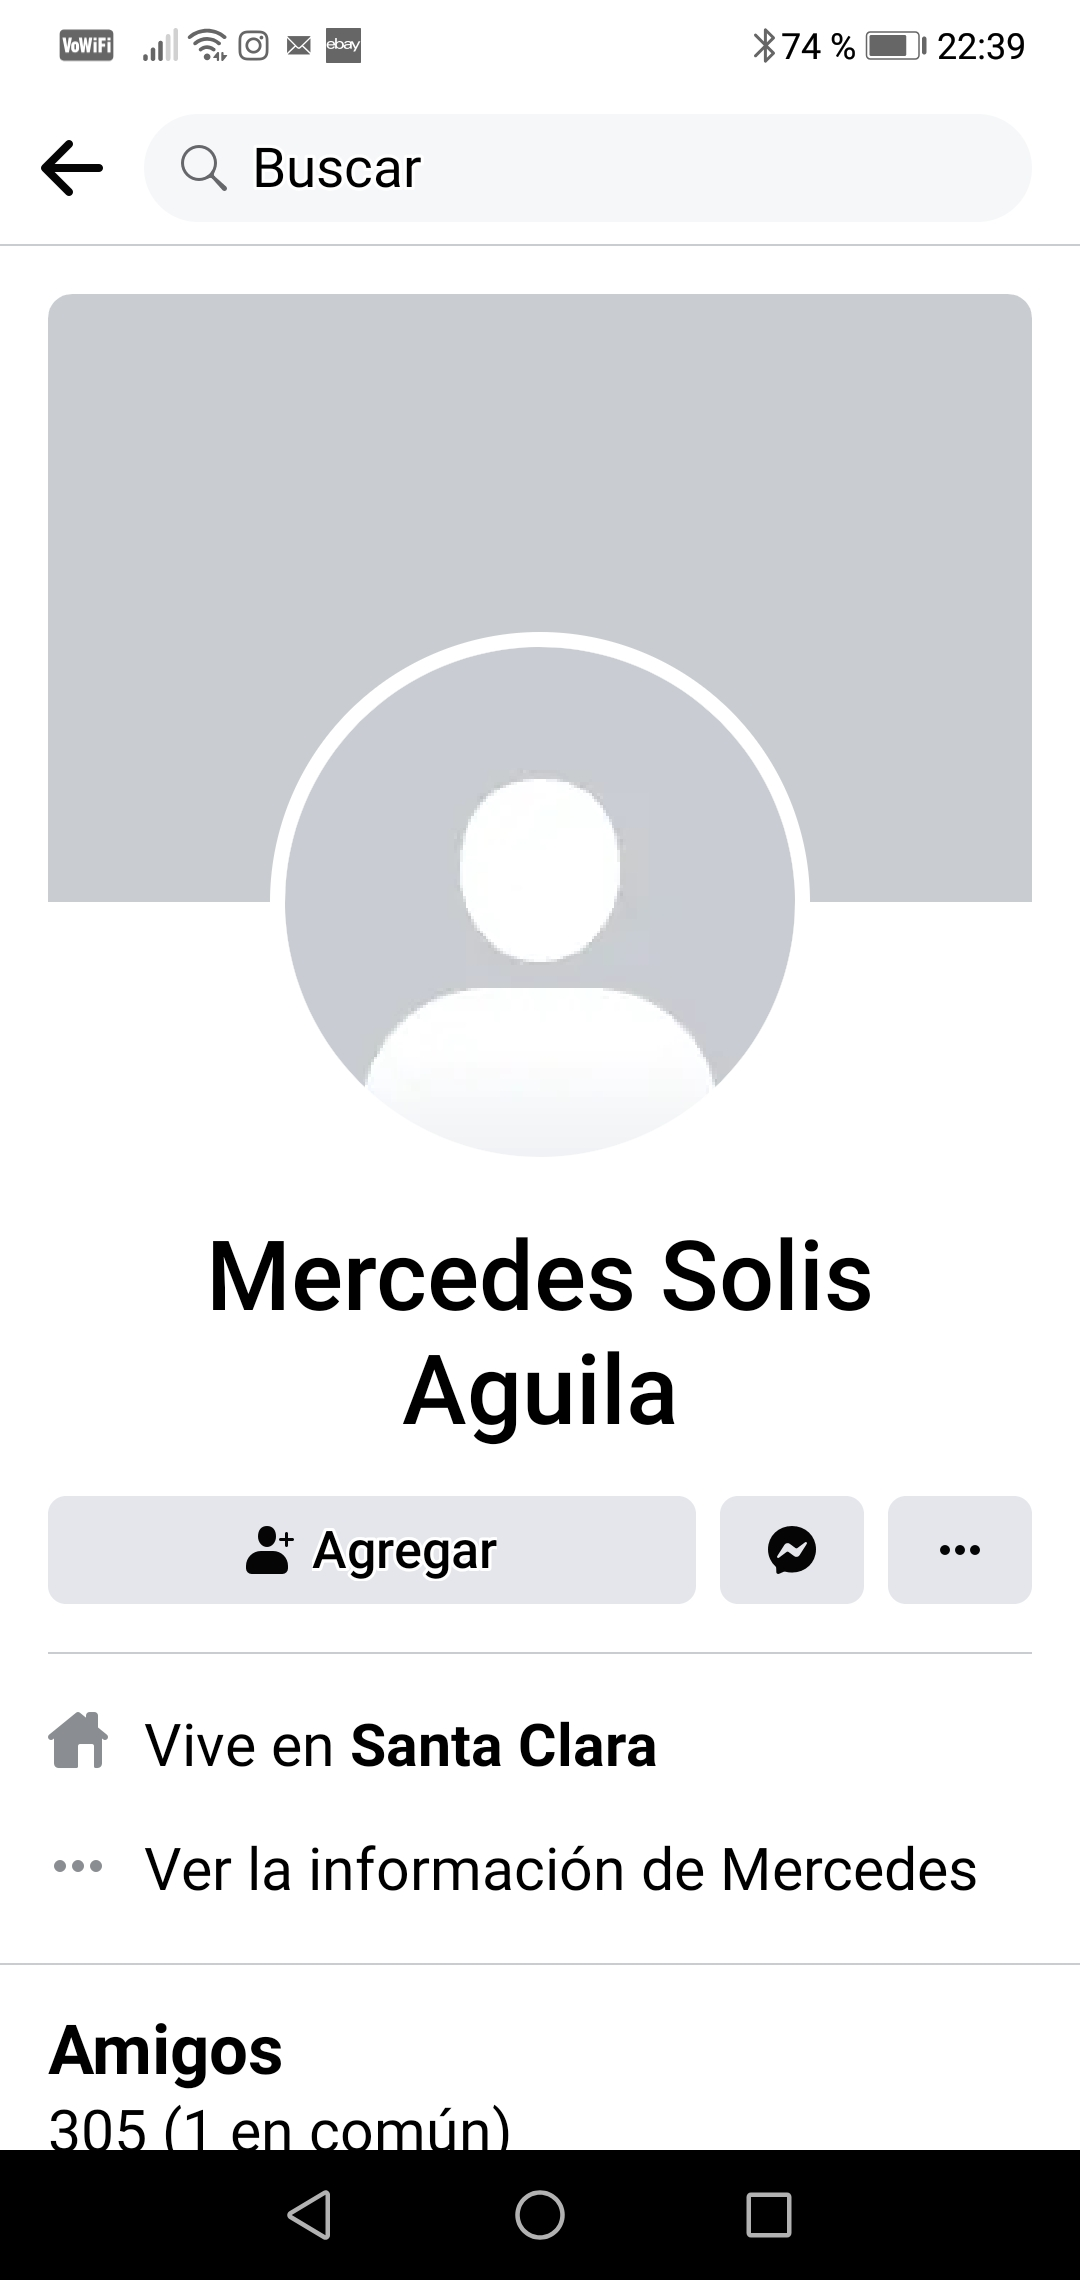 Mercedes Solis Aguila